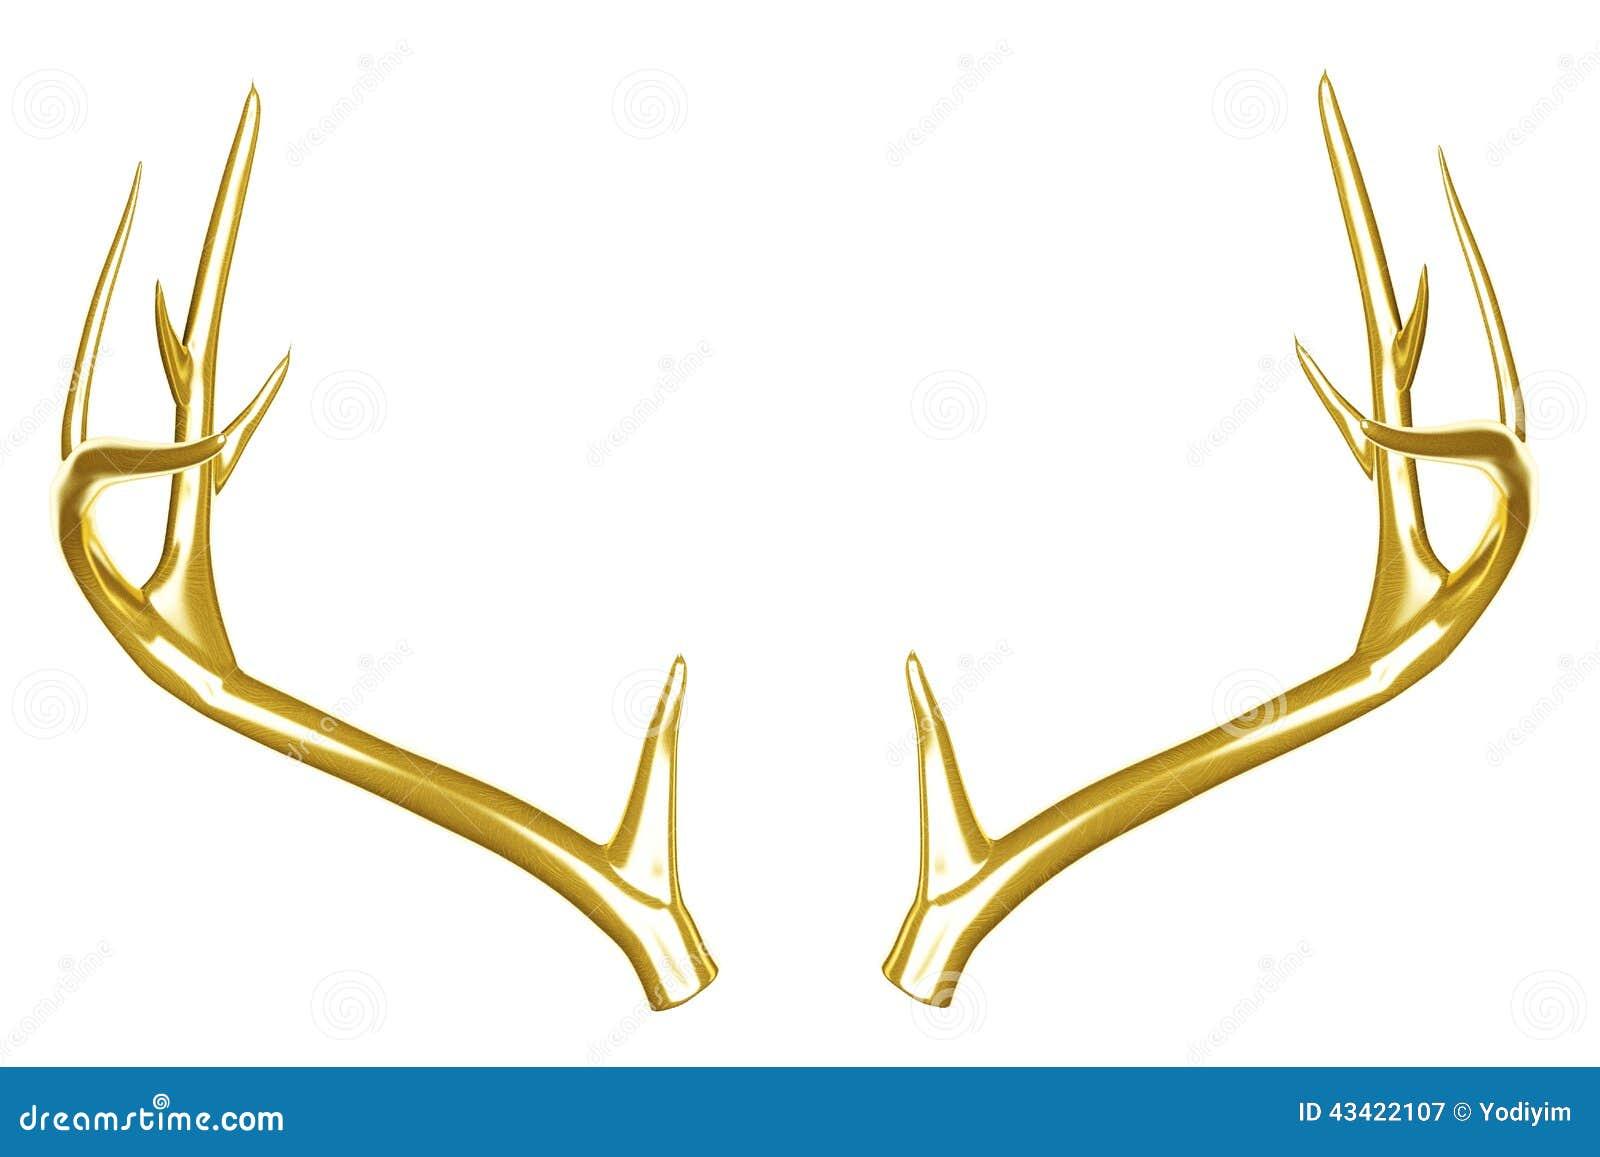 Golden deer antlers. stock image. Image of strong, antler - 43422107